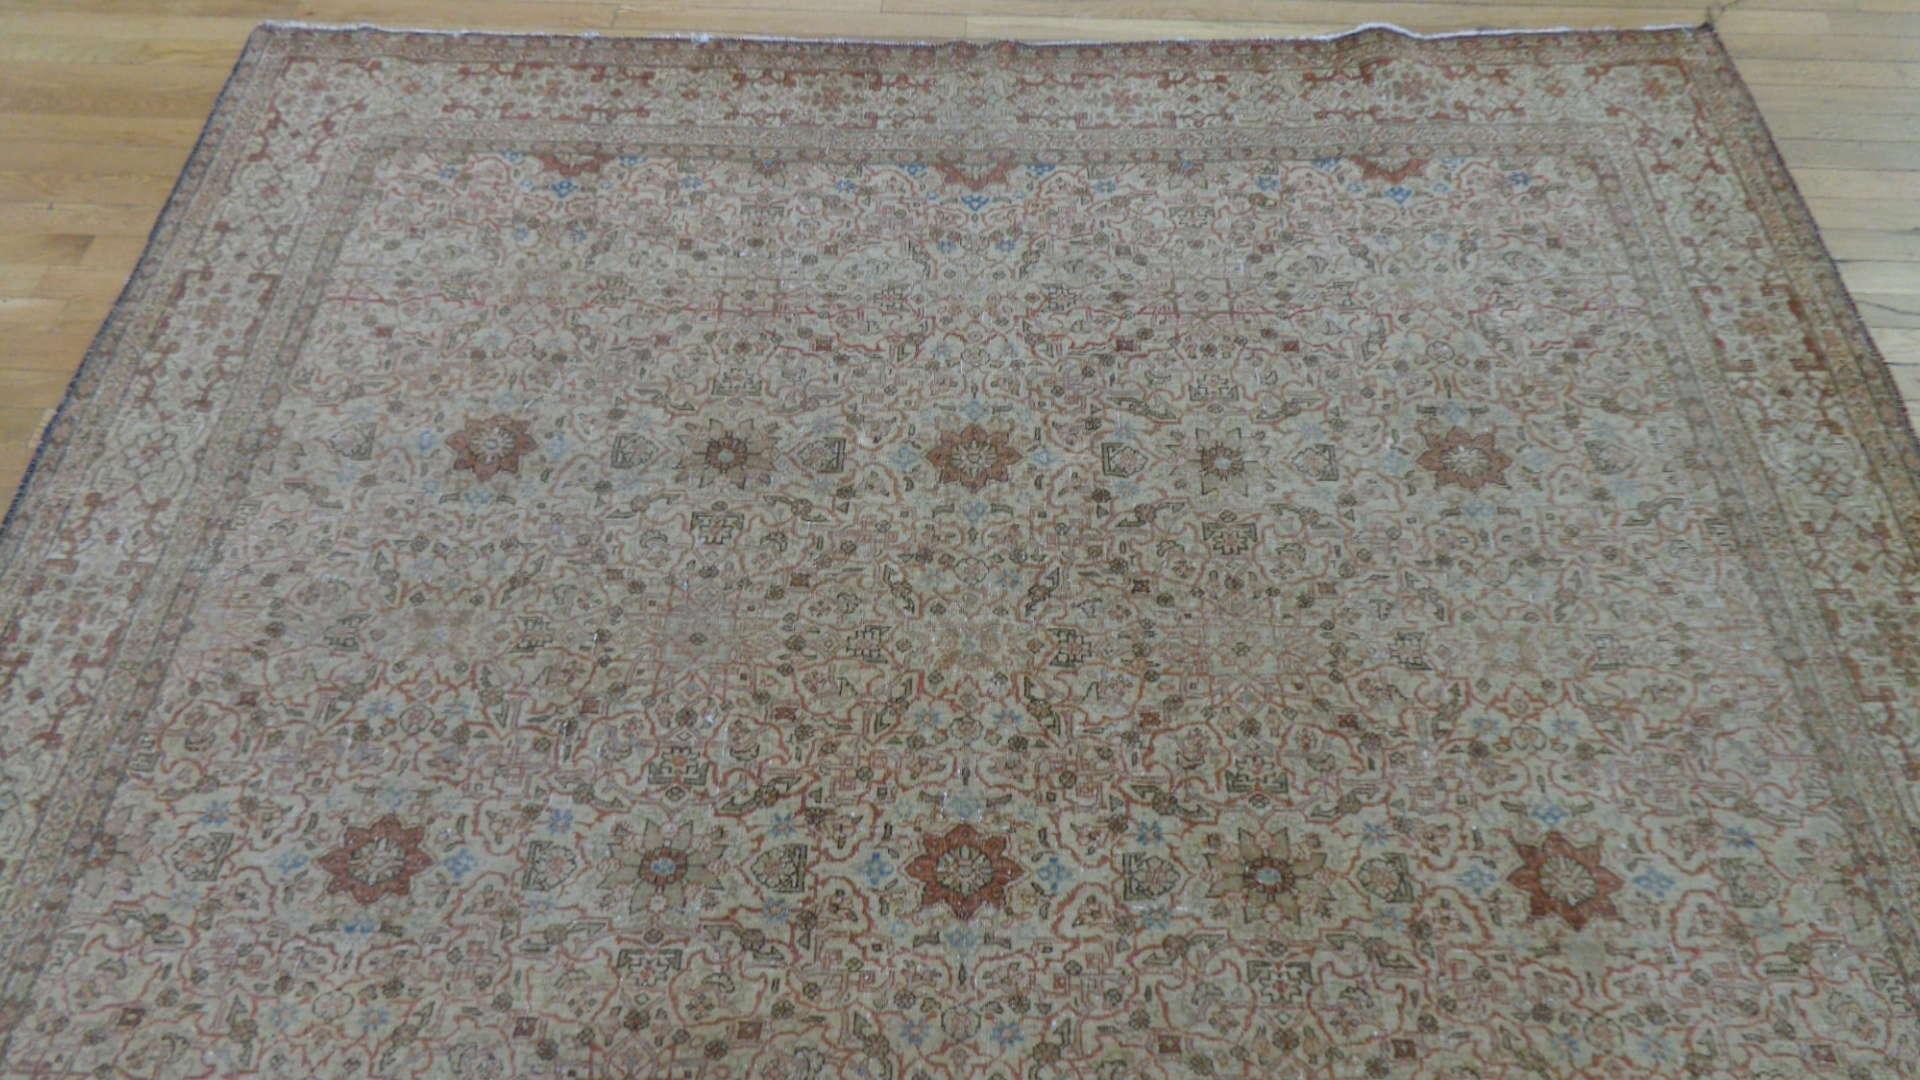 24850 persian tehran carpet 7 x 9, 10-1